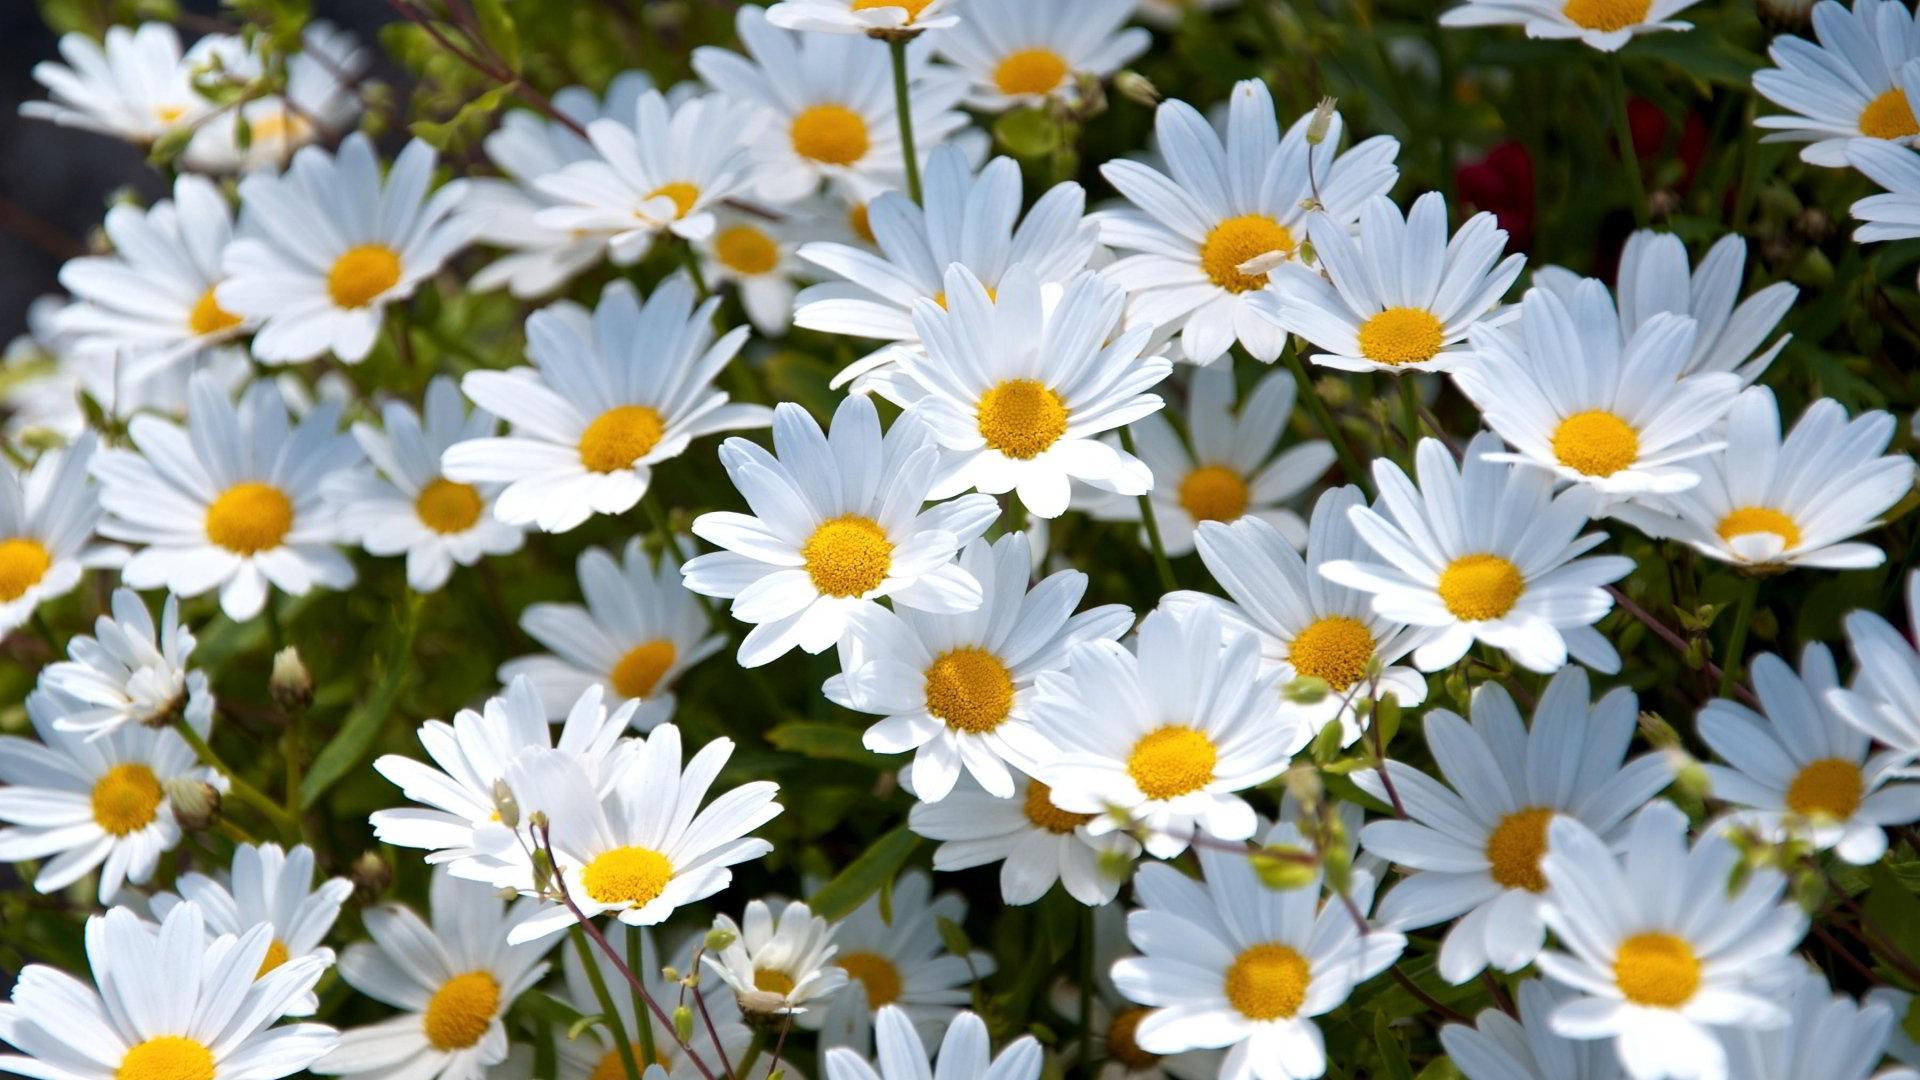 hinh anh hoa cuc dep 38